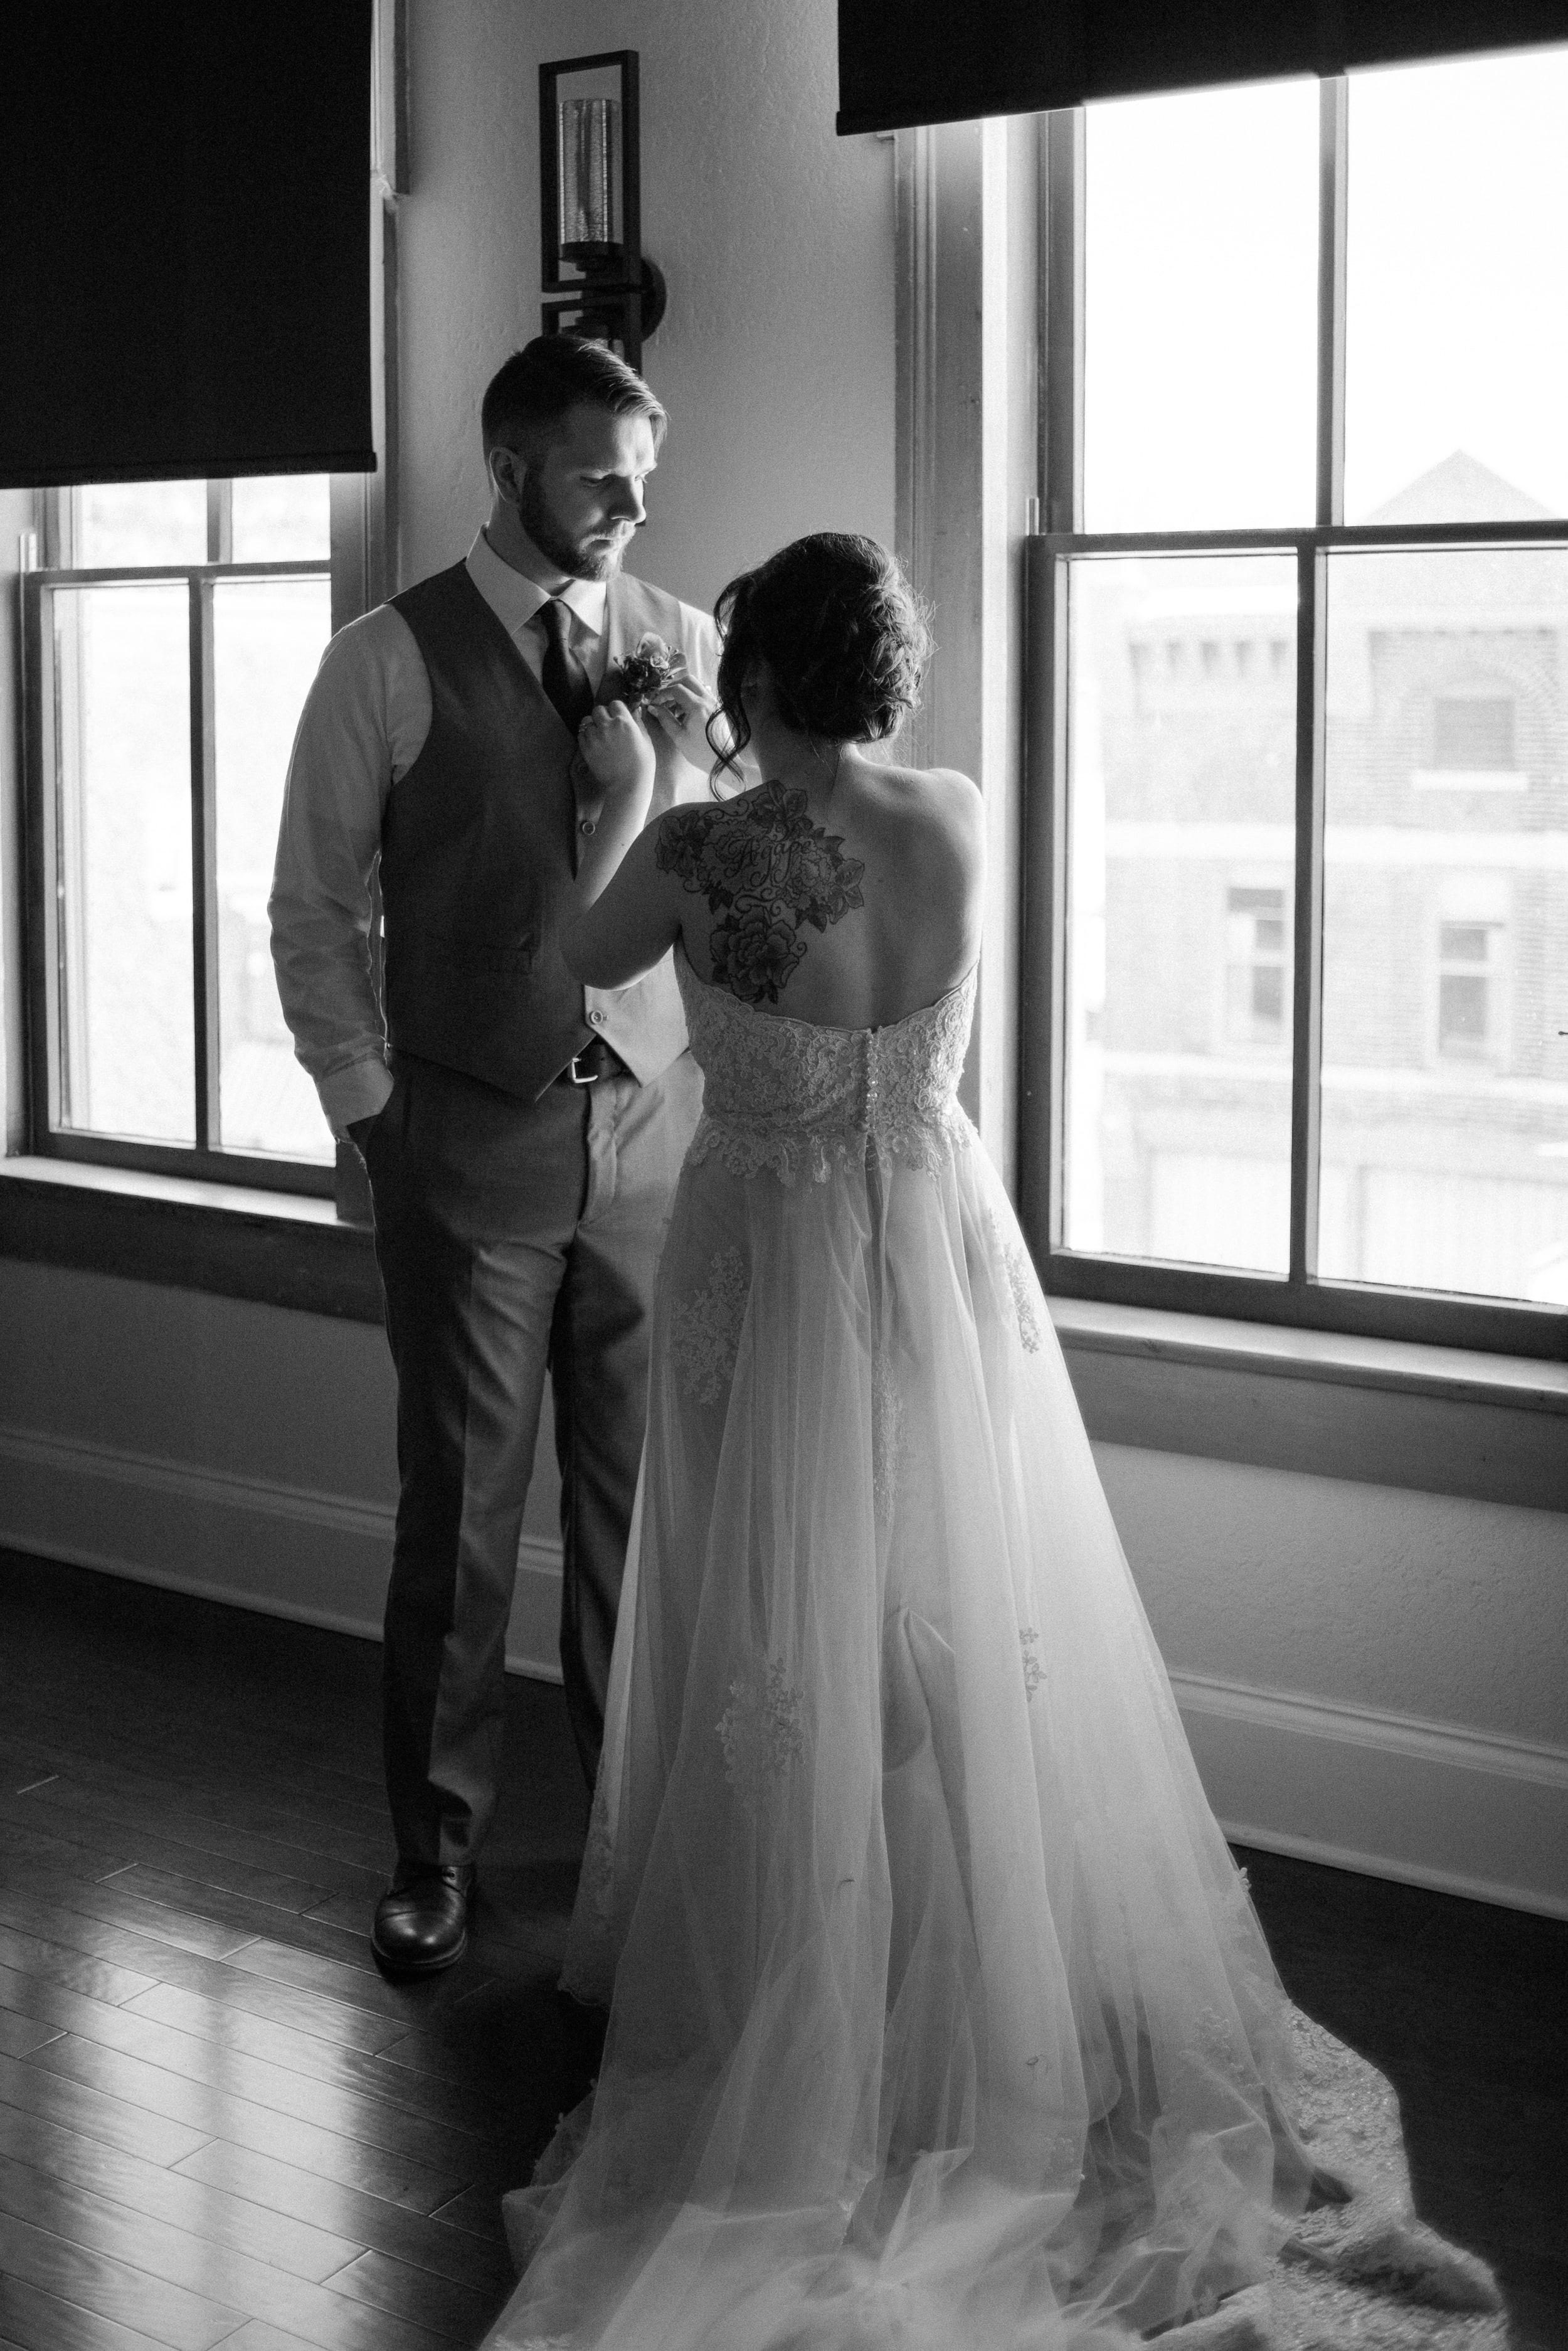 snowy-intimate-wedding-10.jpg